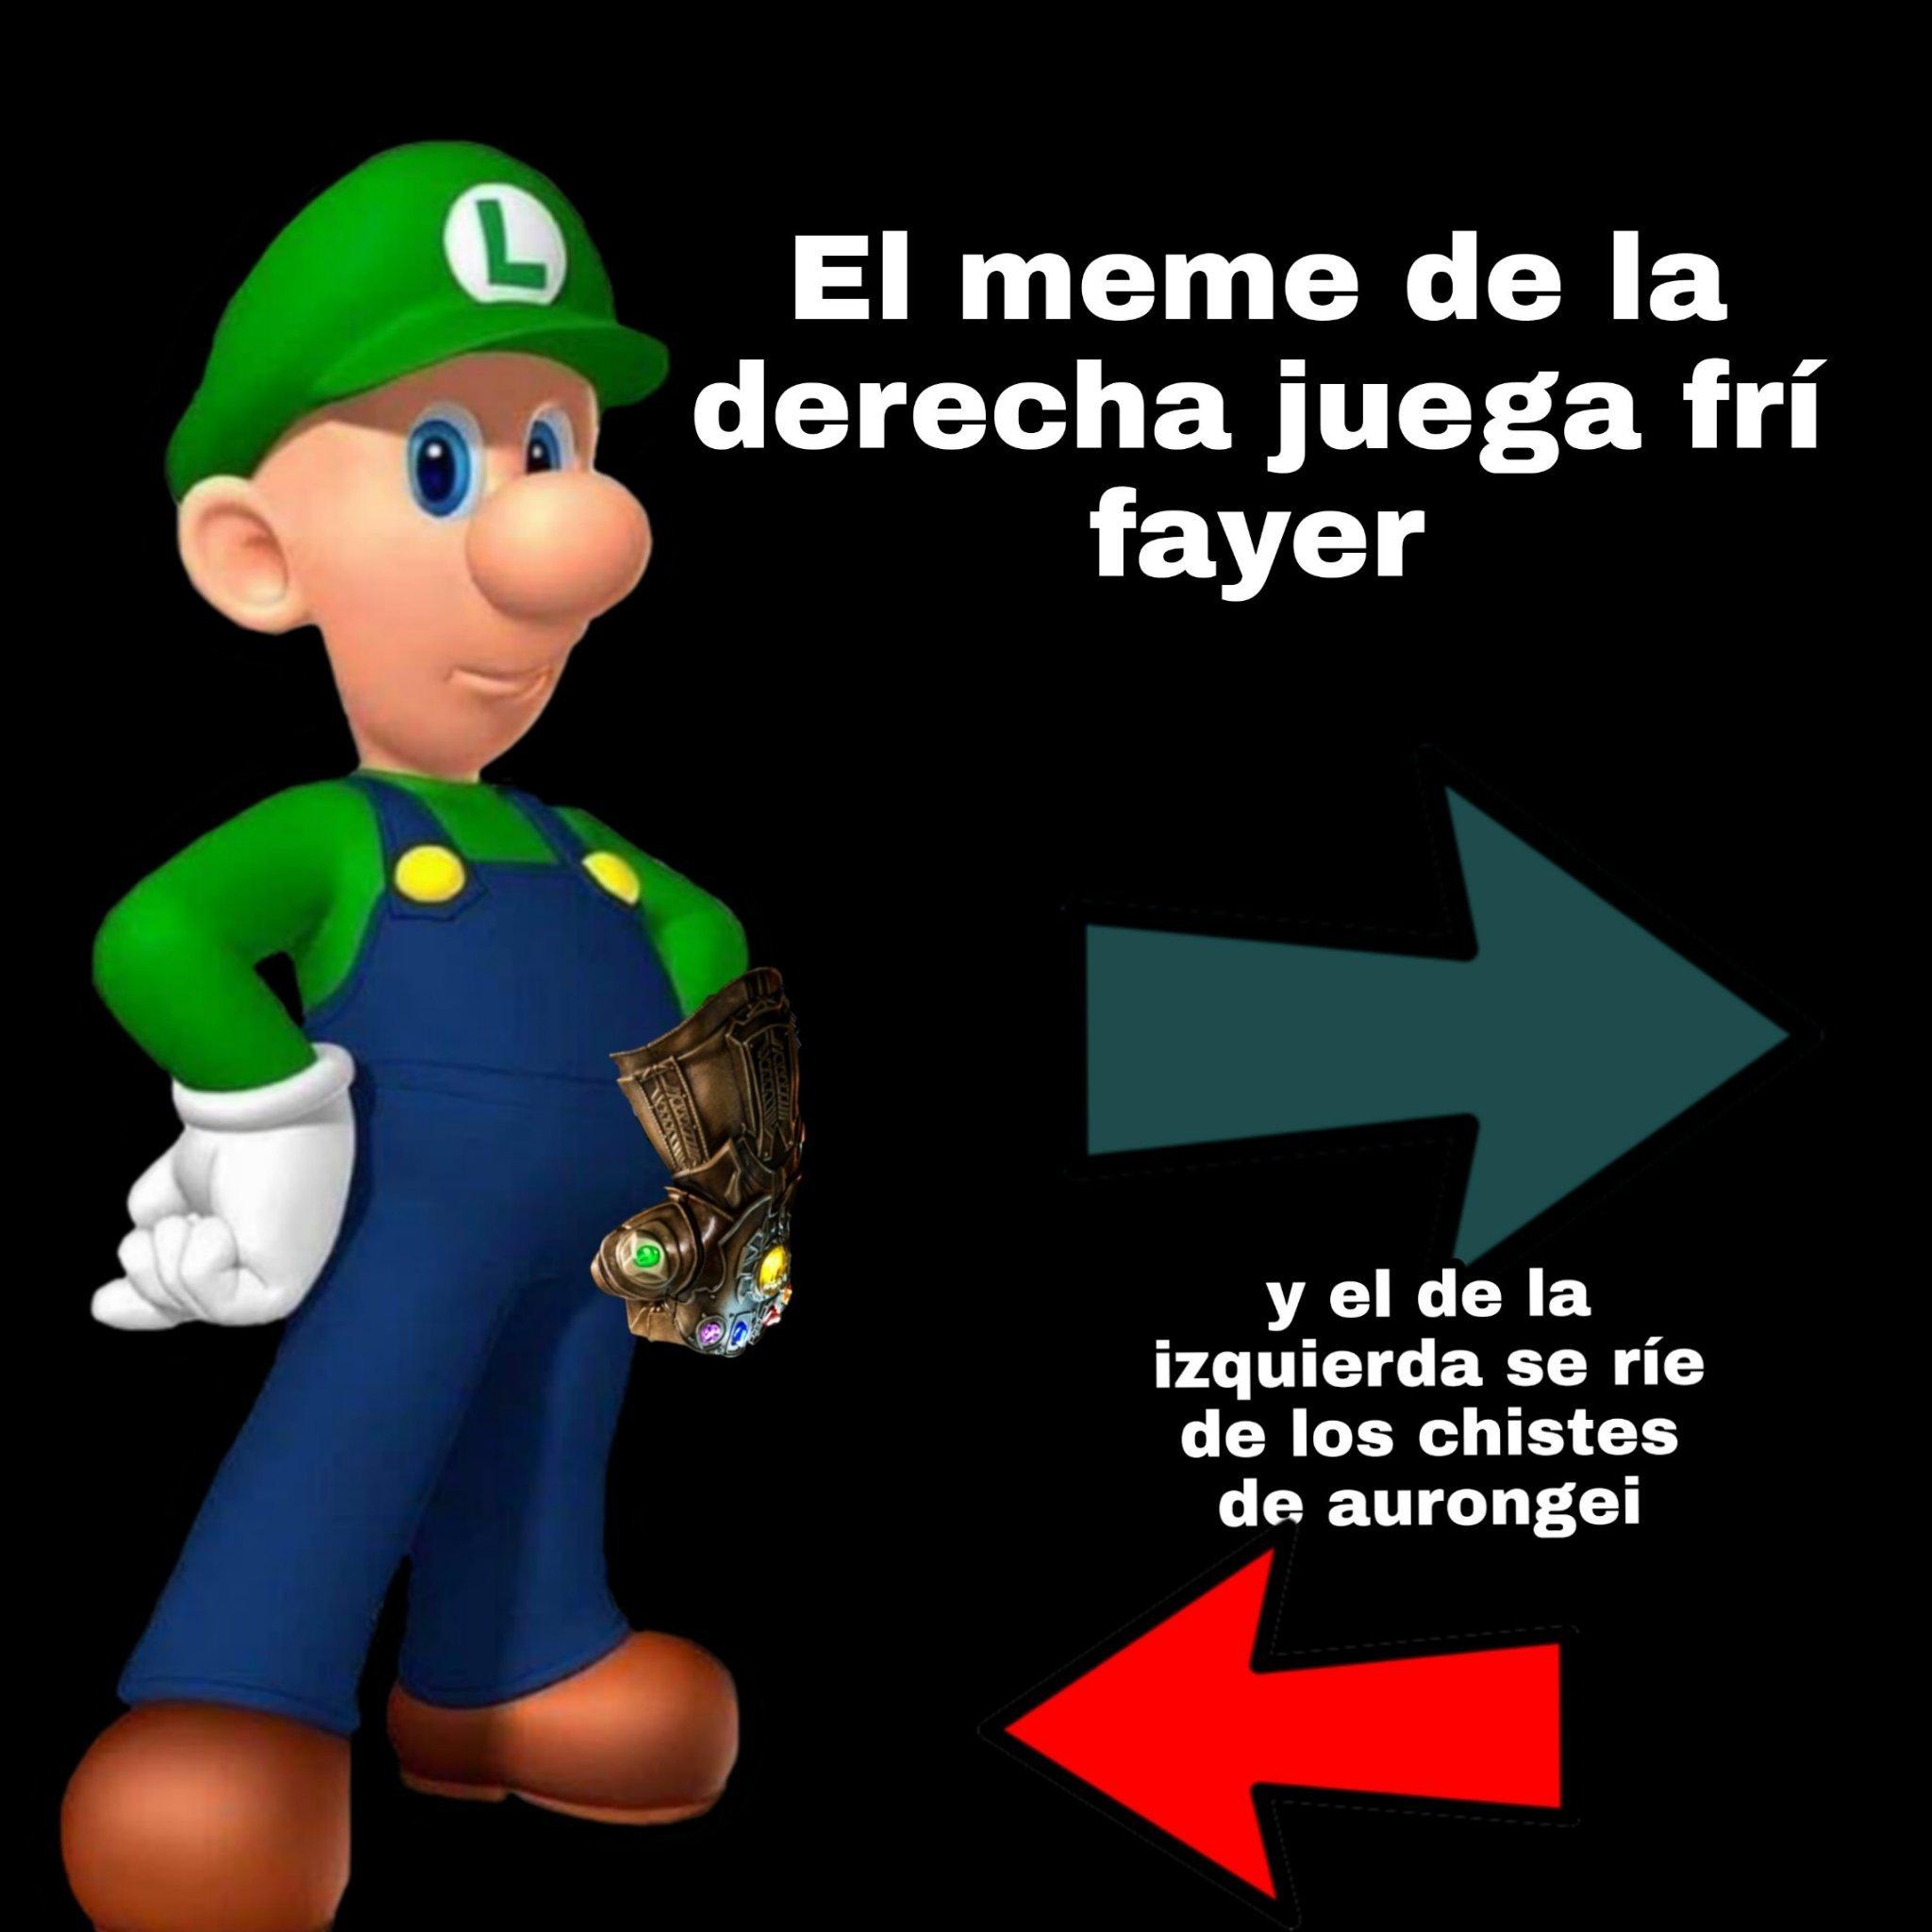 https://youtu.be/nVEdZb9Fyes - meme